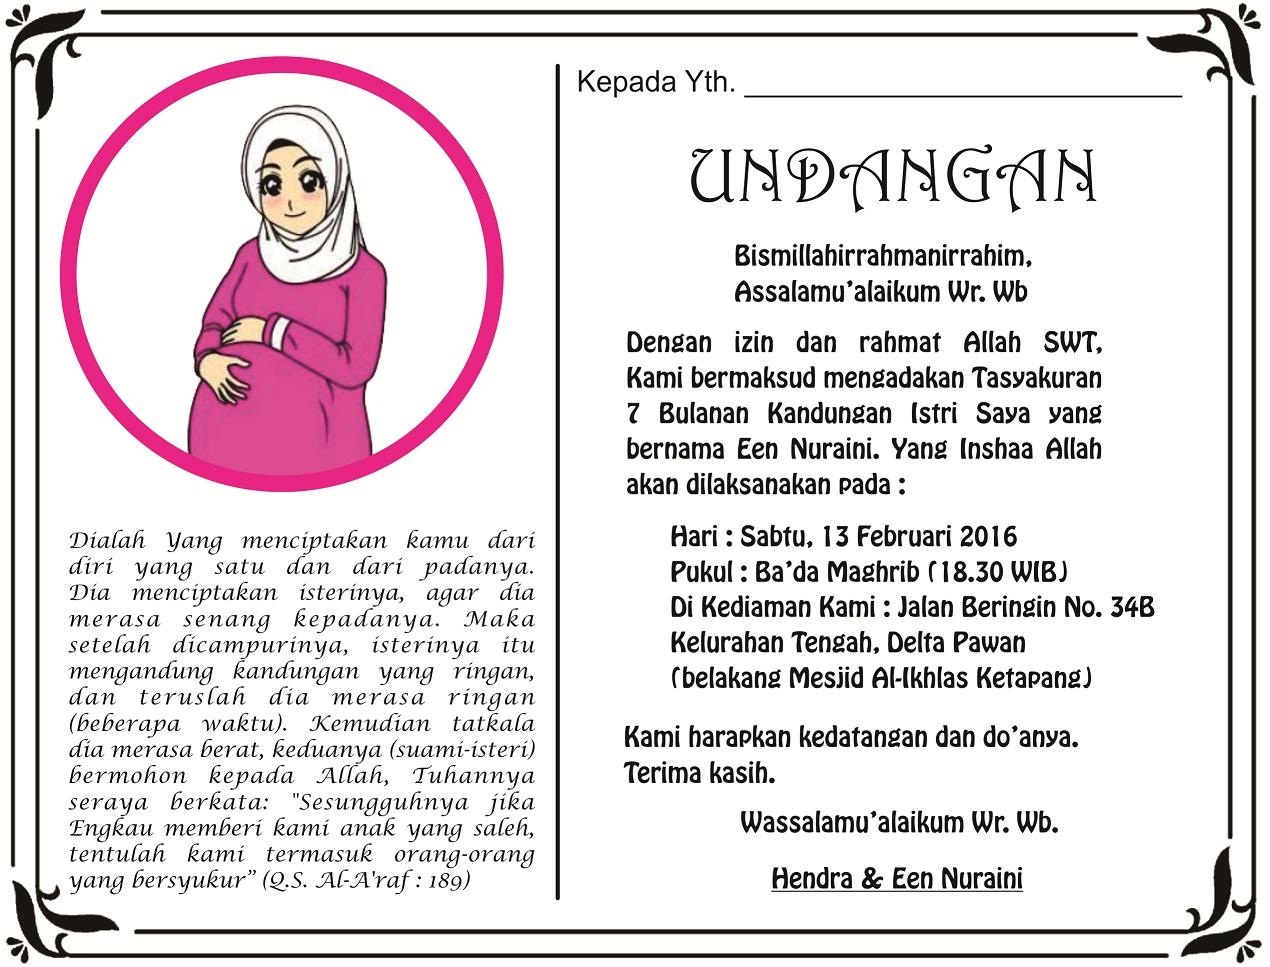 Contoh Kata Kata Undangan 7 Bulanan Kehamilan